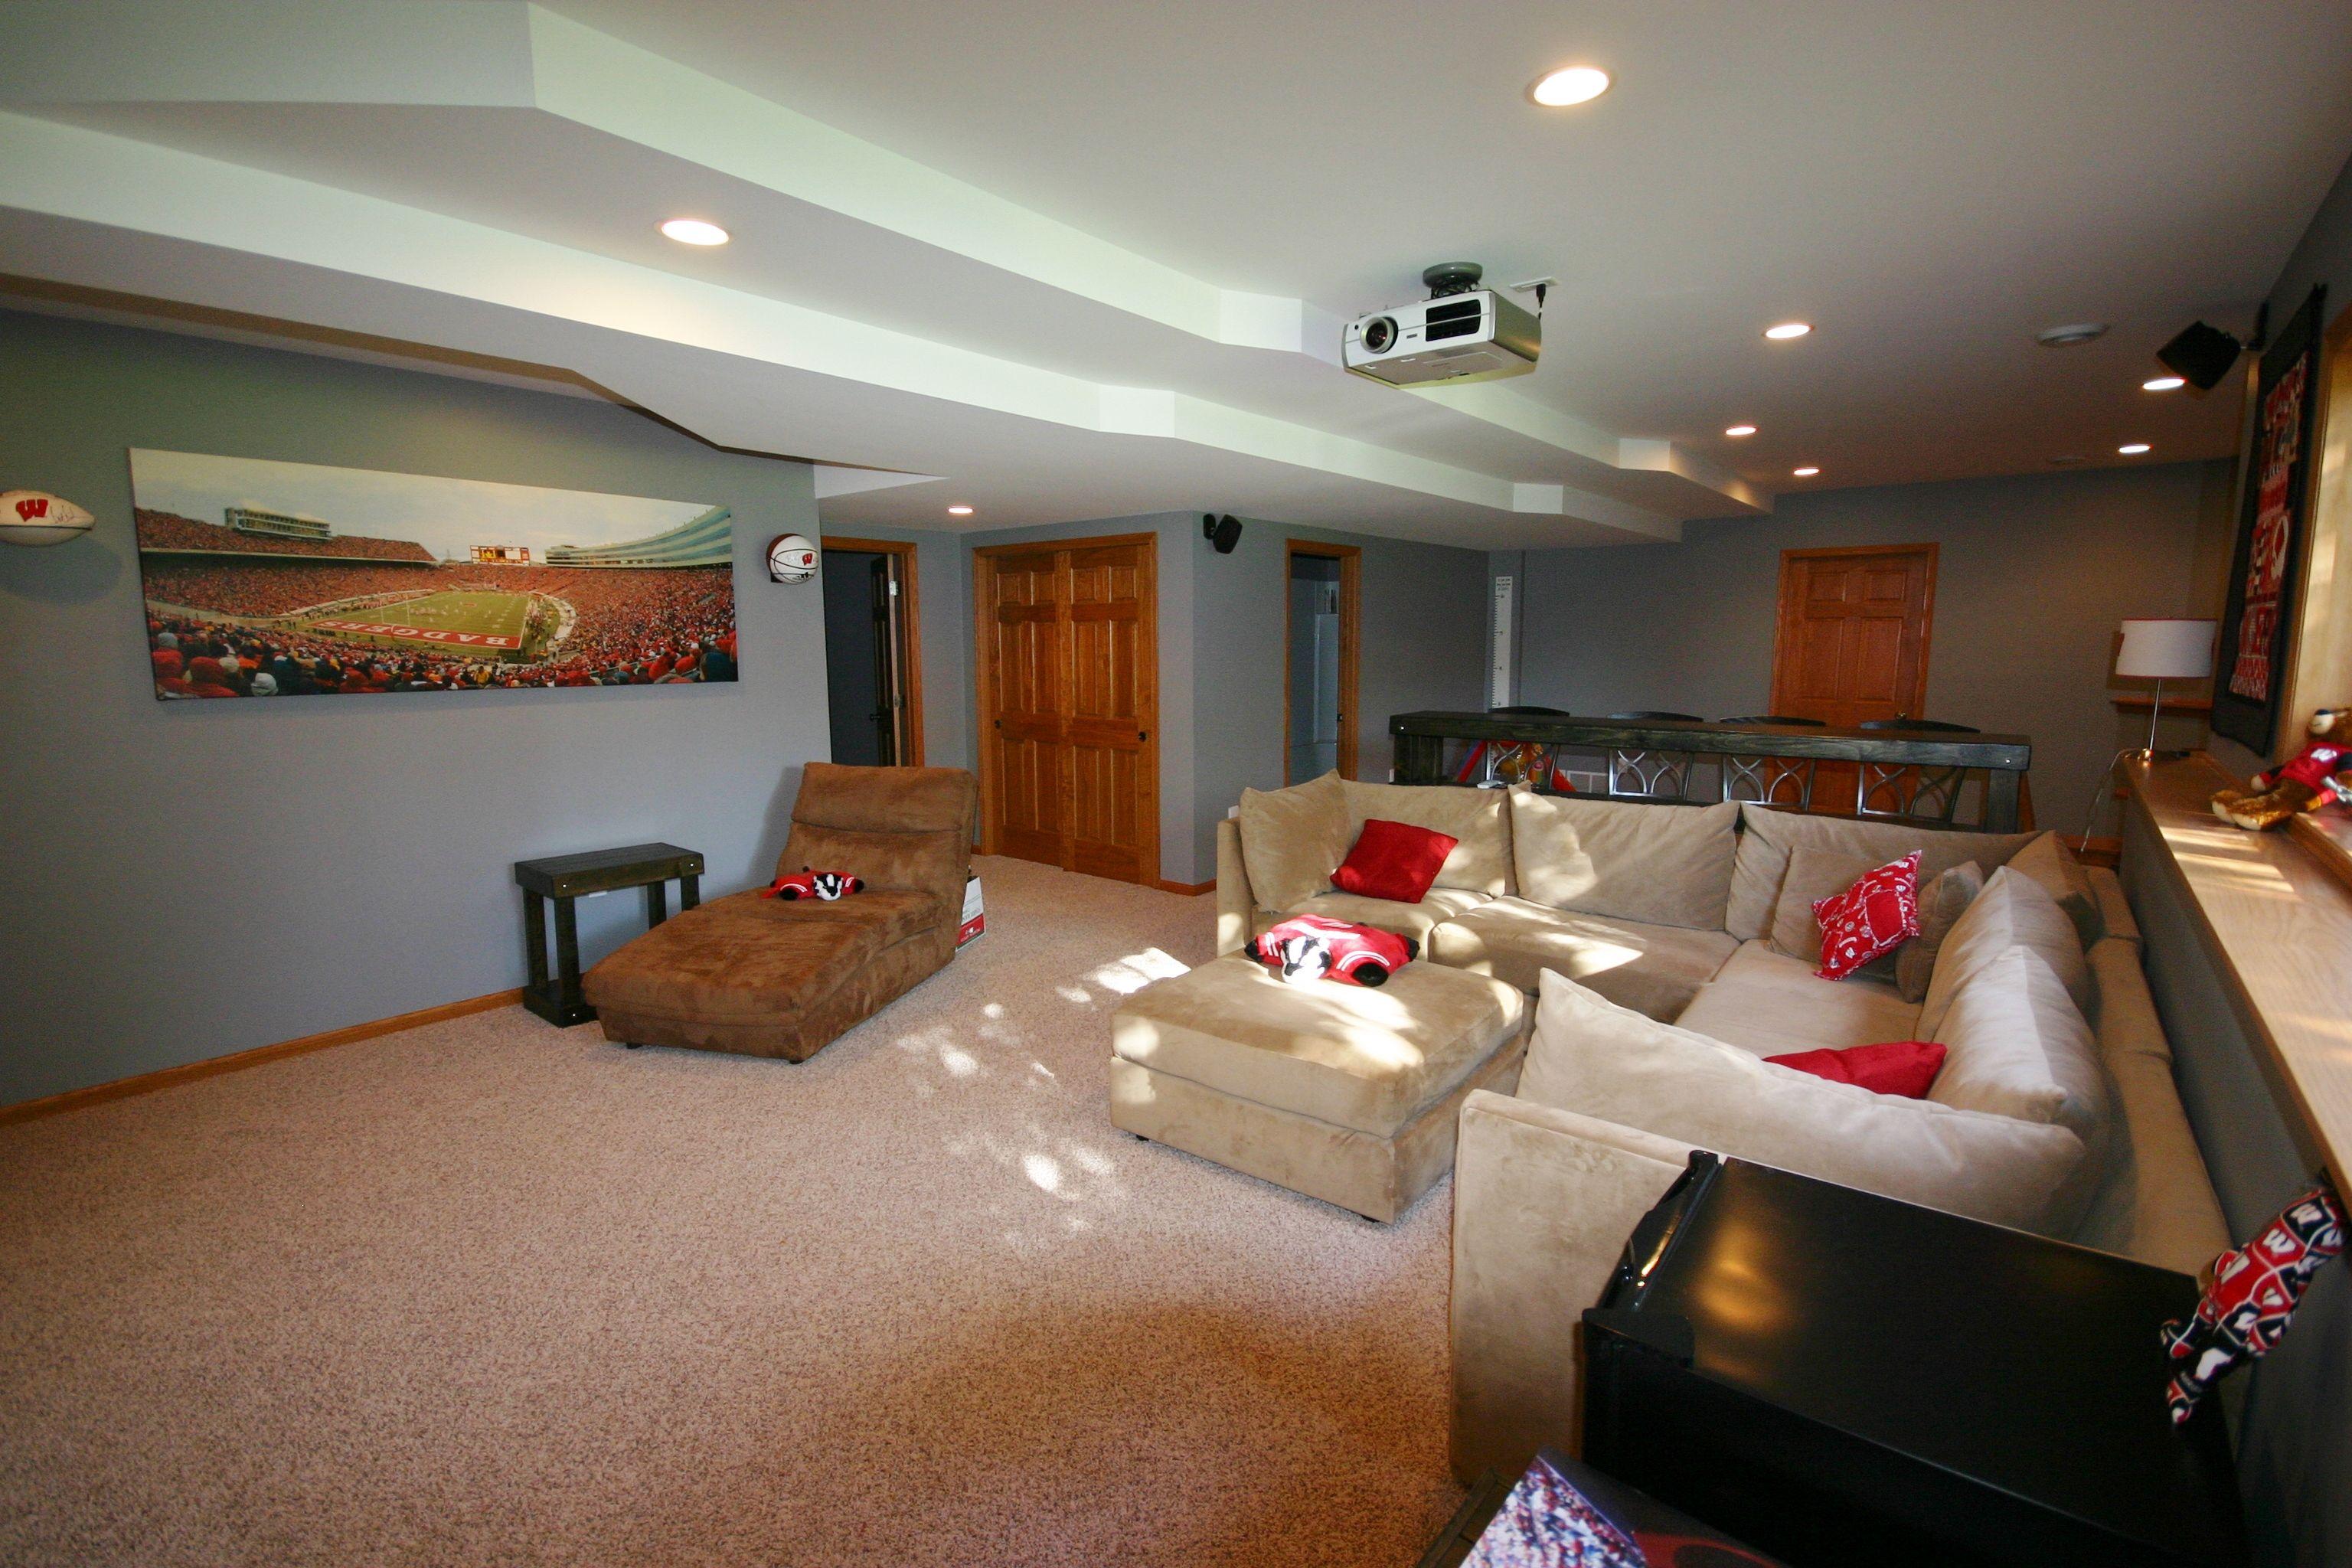 Basement Finish, With Carpeting, Oak Trimmed Ledge